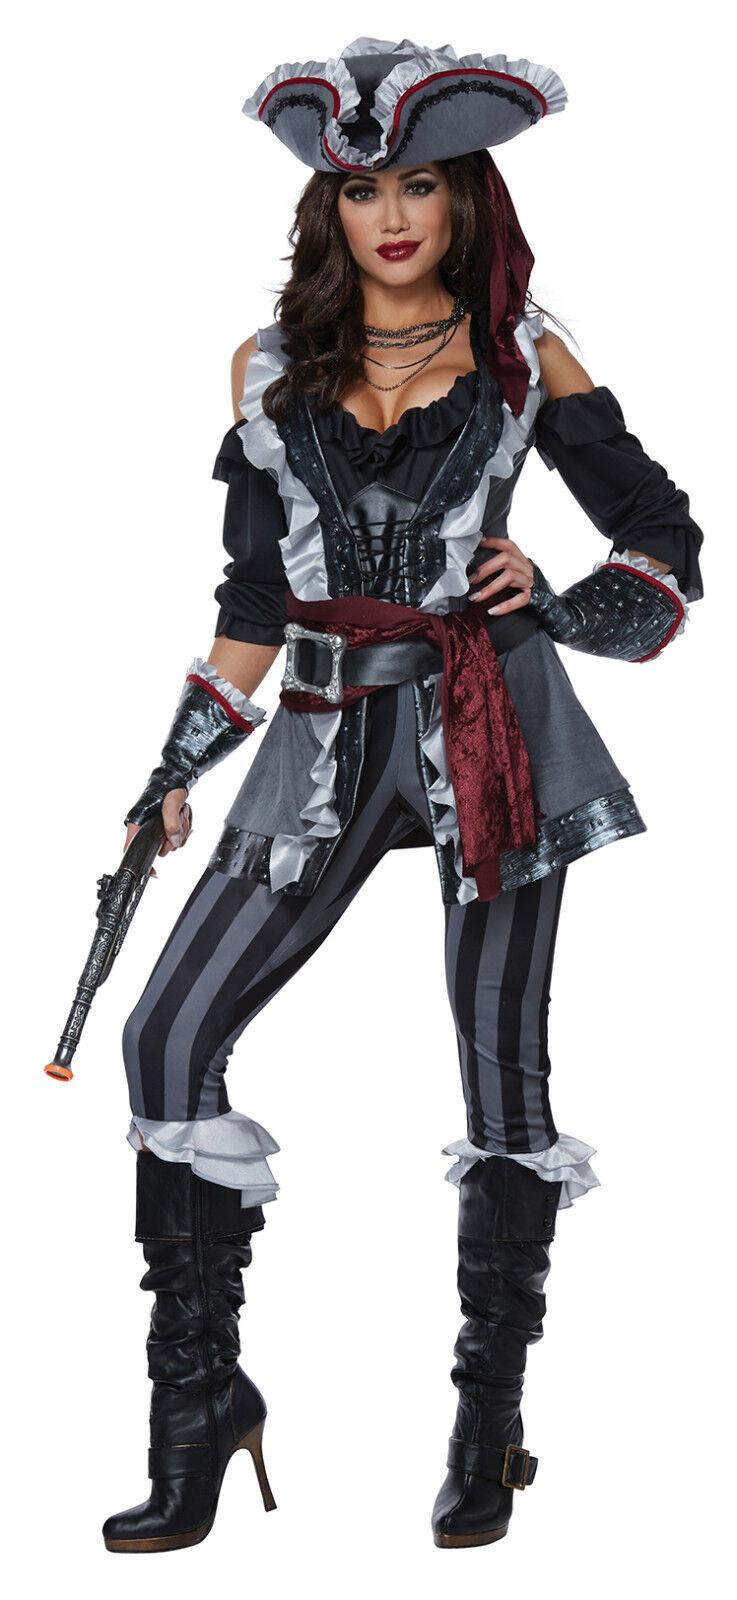 Captain Black Heart Pirate Halloween Costume